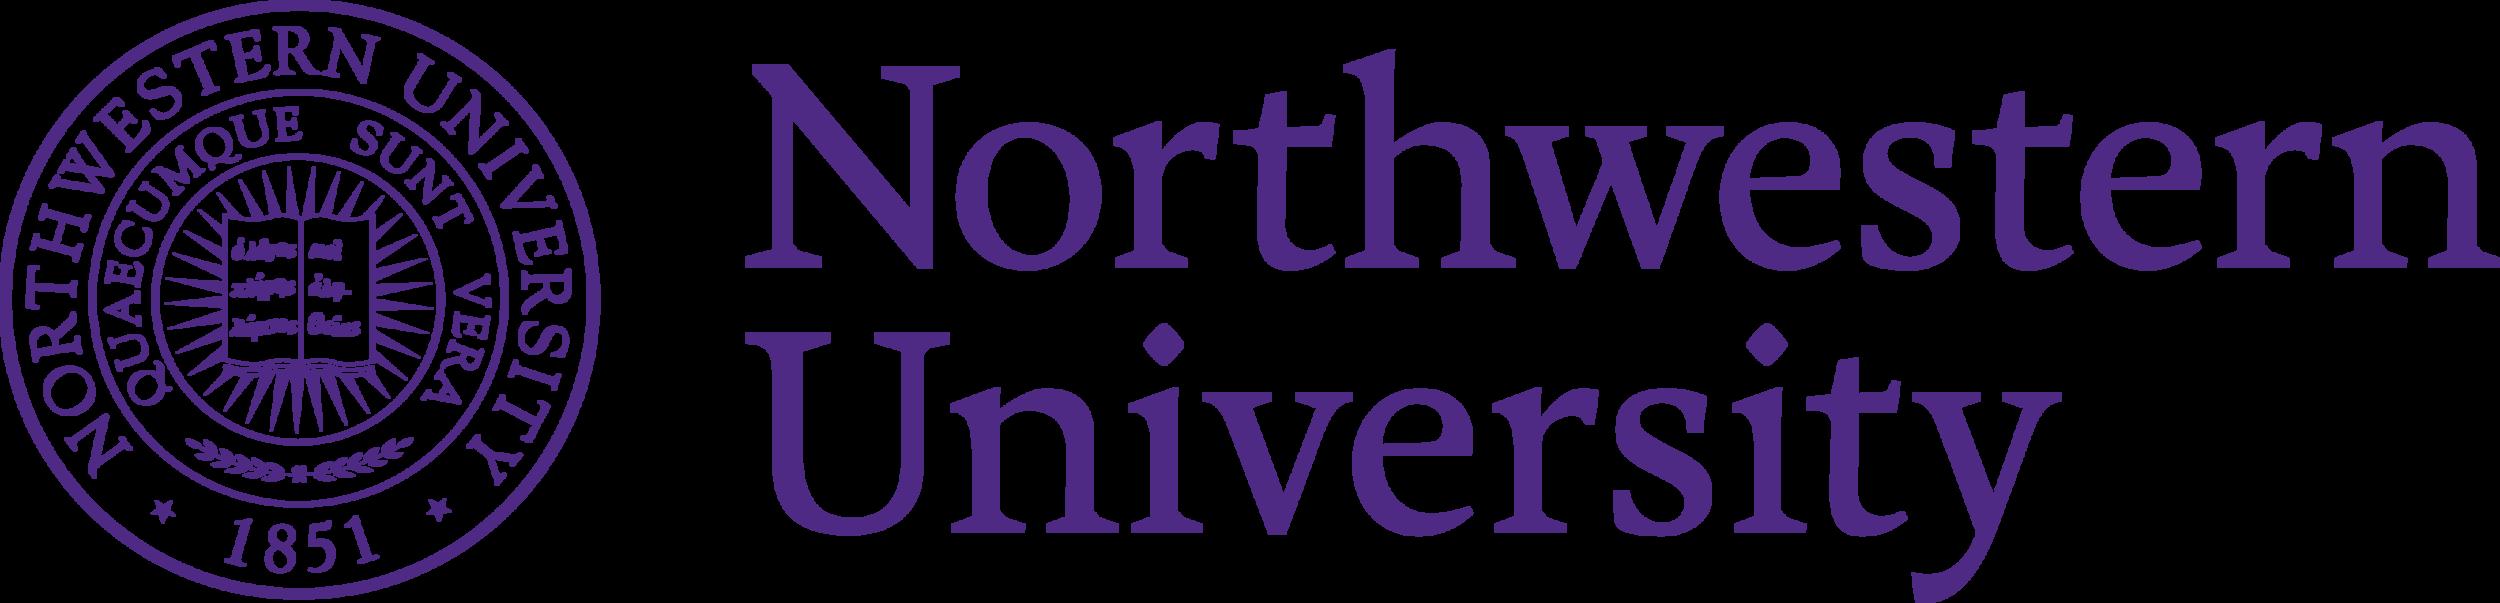 Northwestern-Formal_horizontal-24kckvk.png